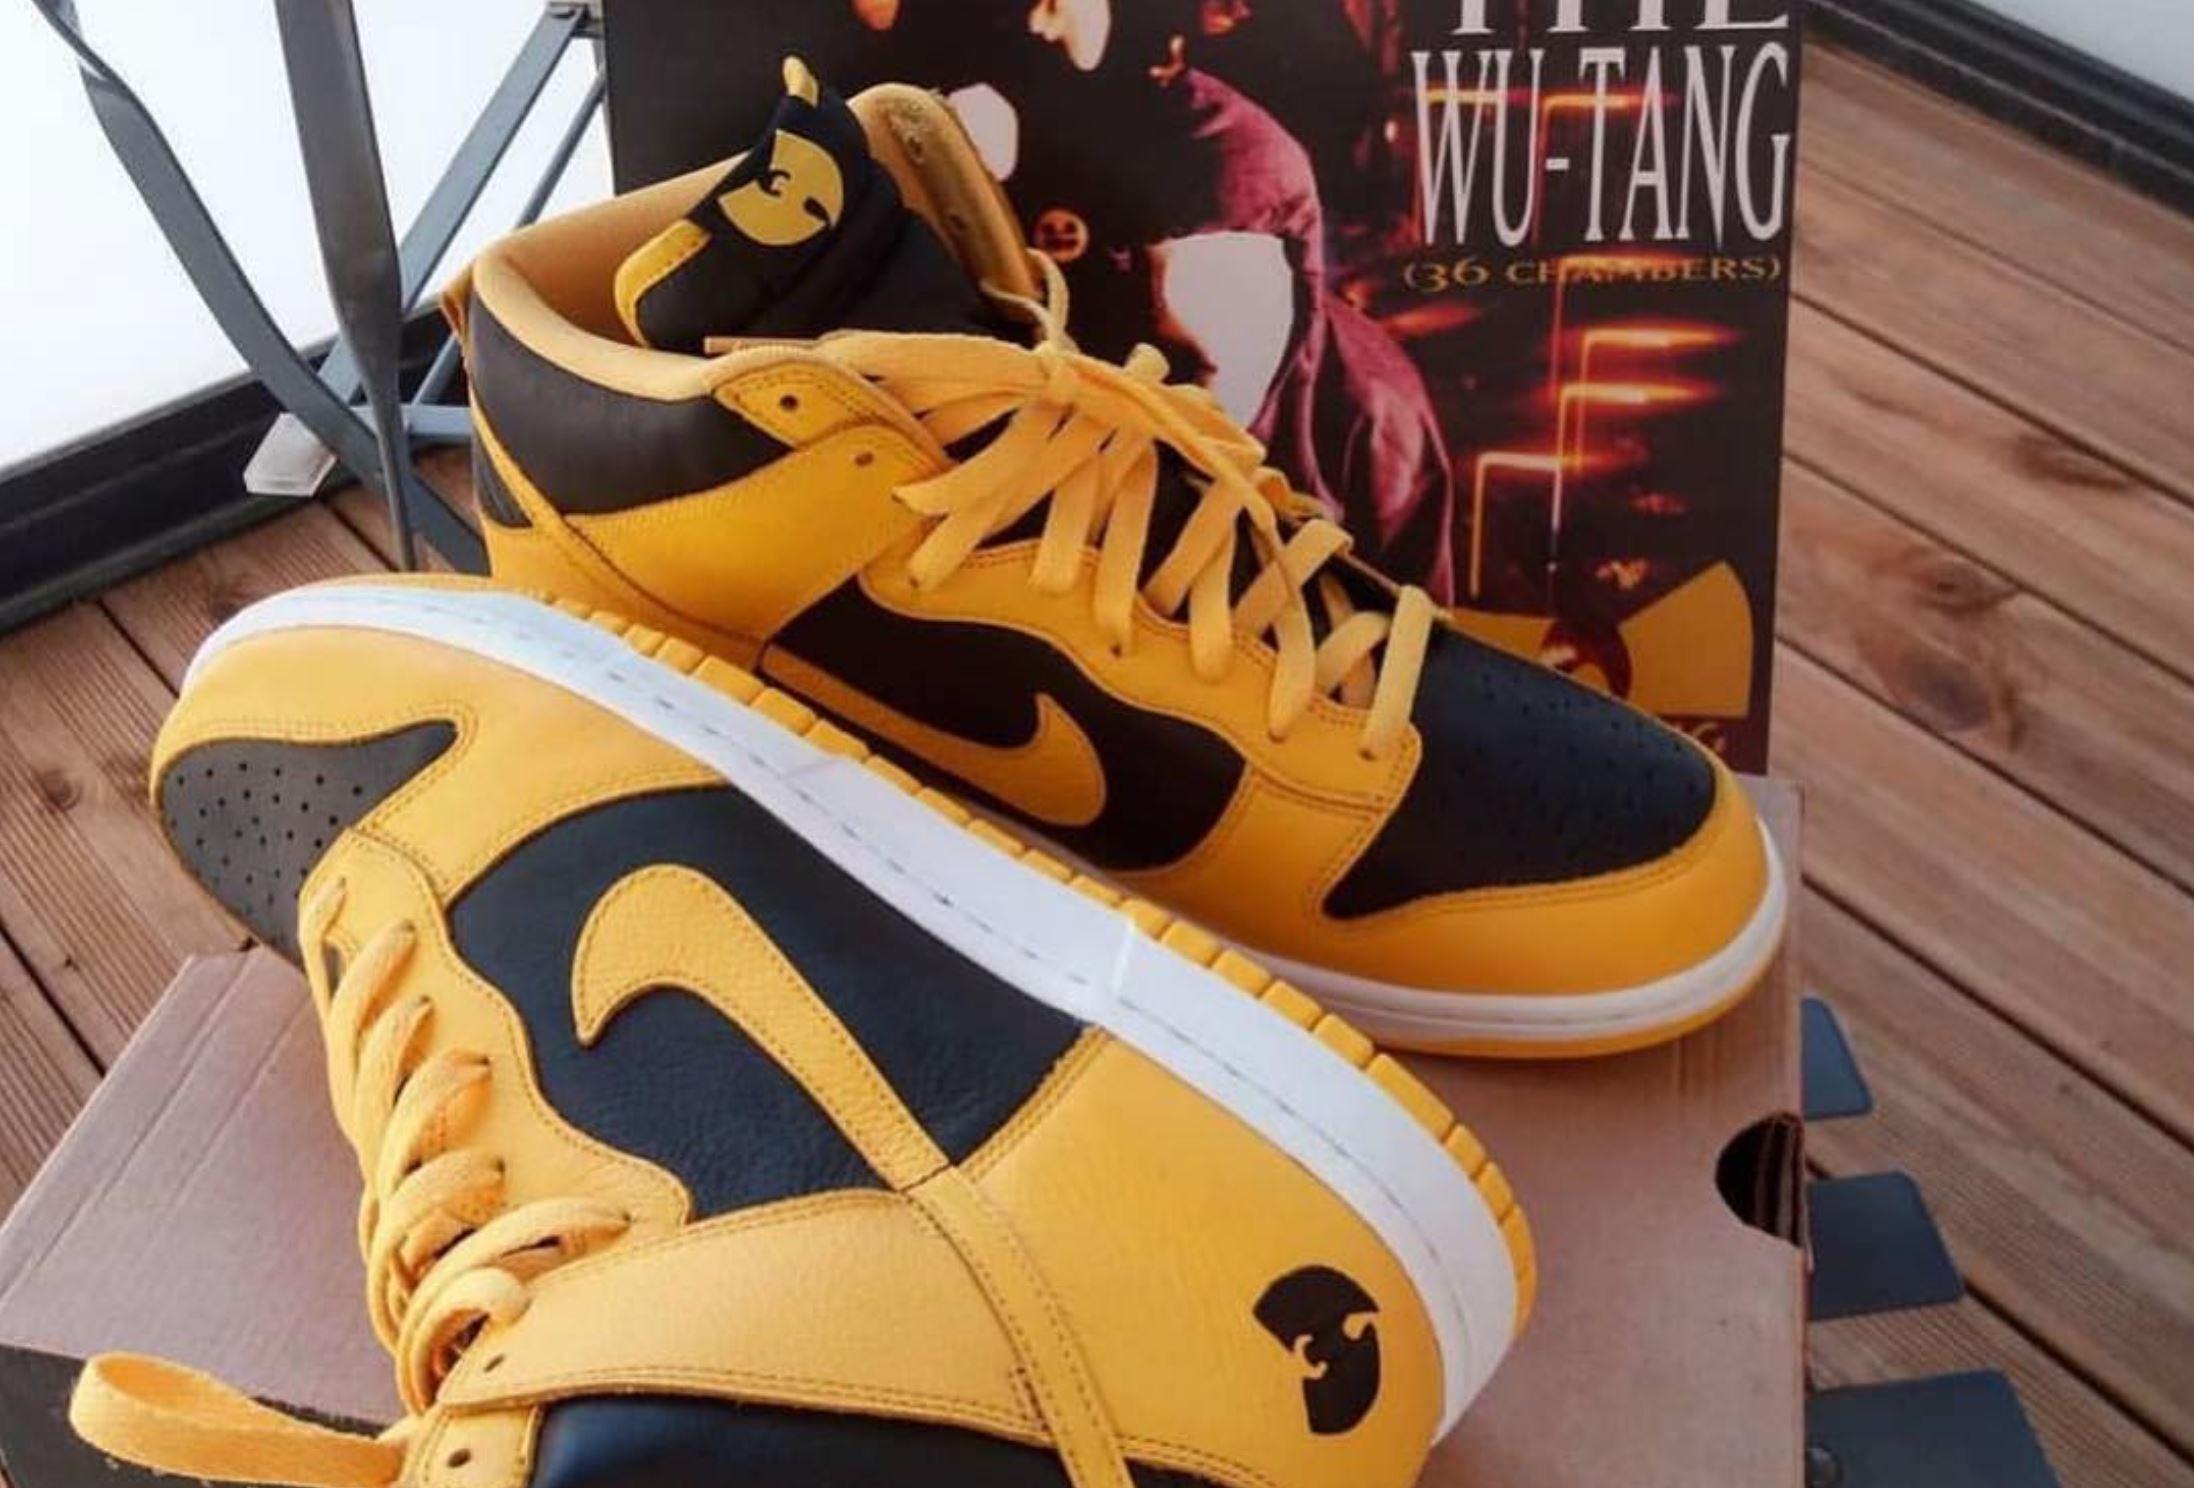 Method Man Calls for a 'Wu-Tang' Dunk